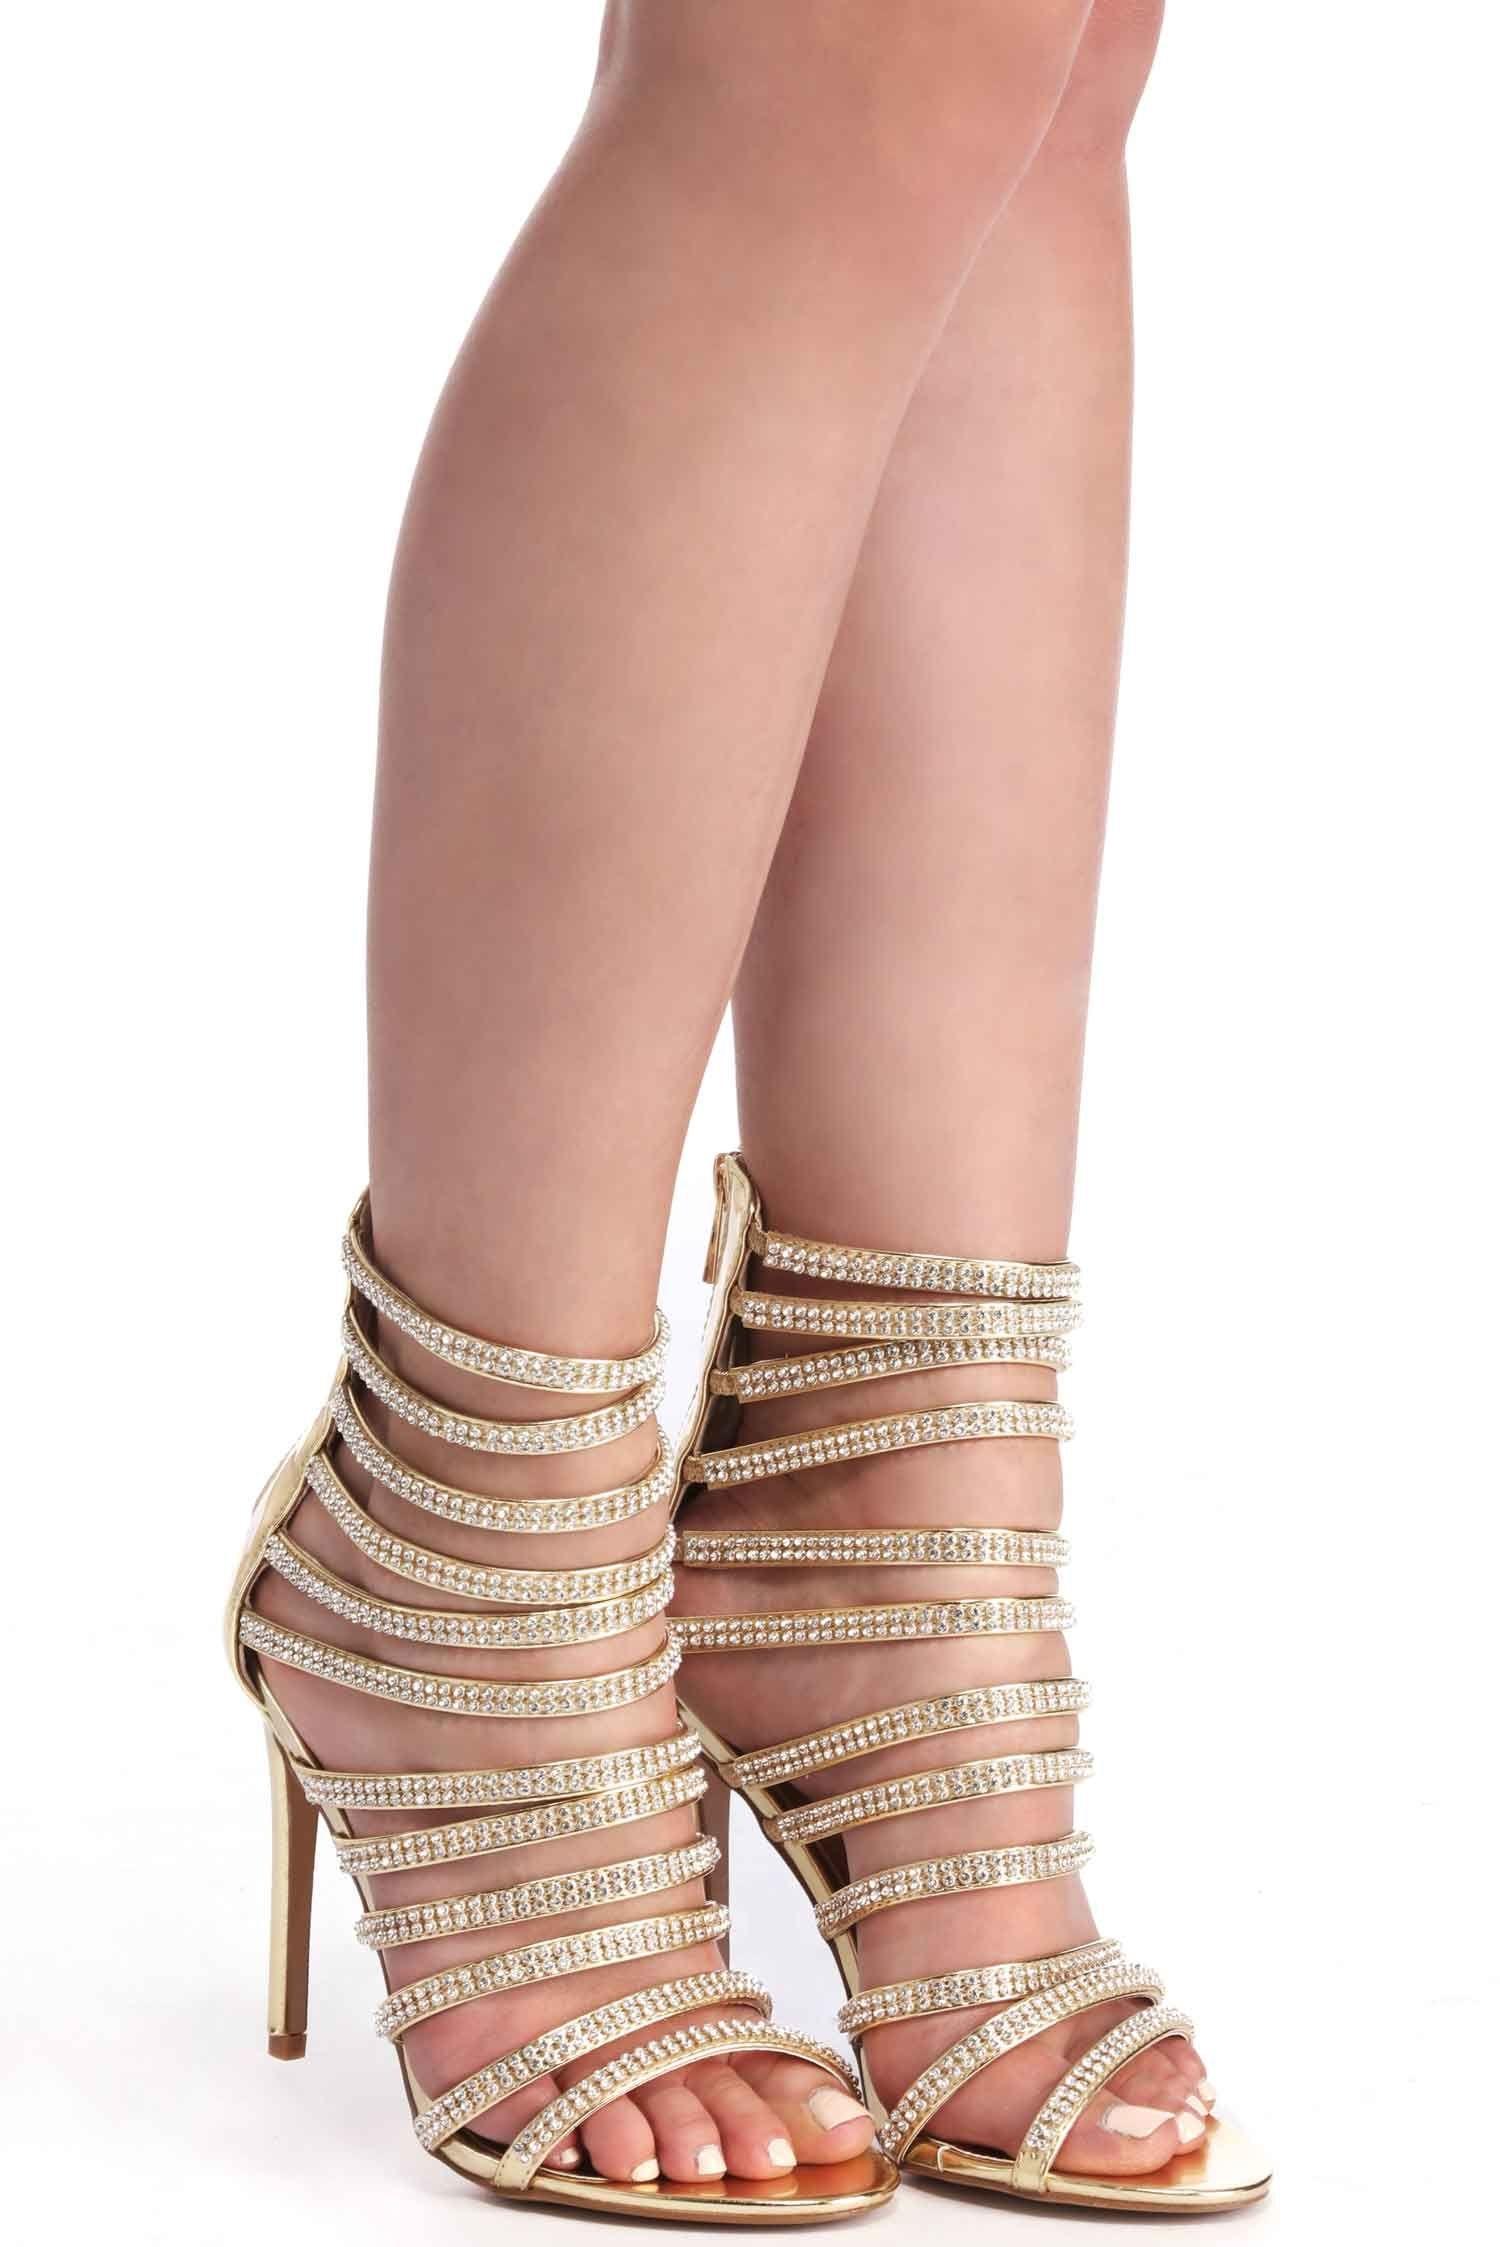 687aa4b392d Gold Strappy Rhinestone Heels